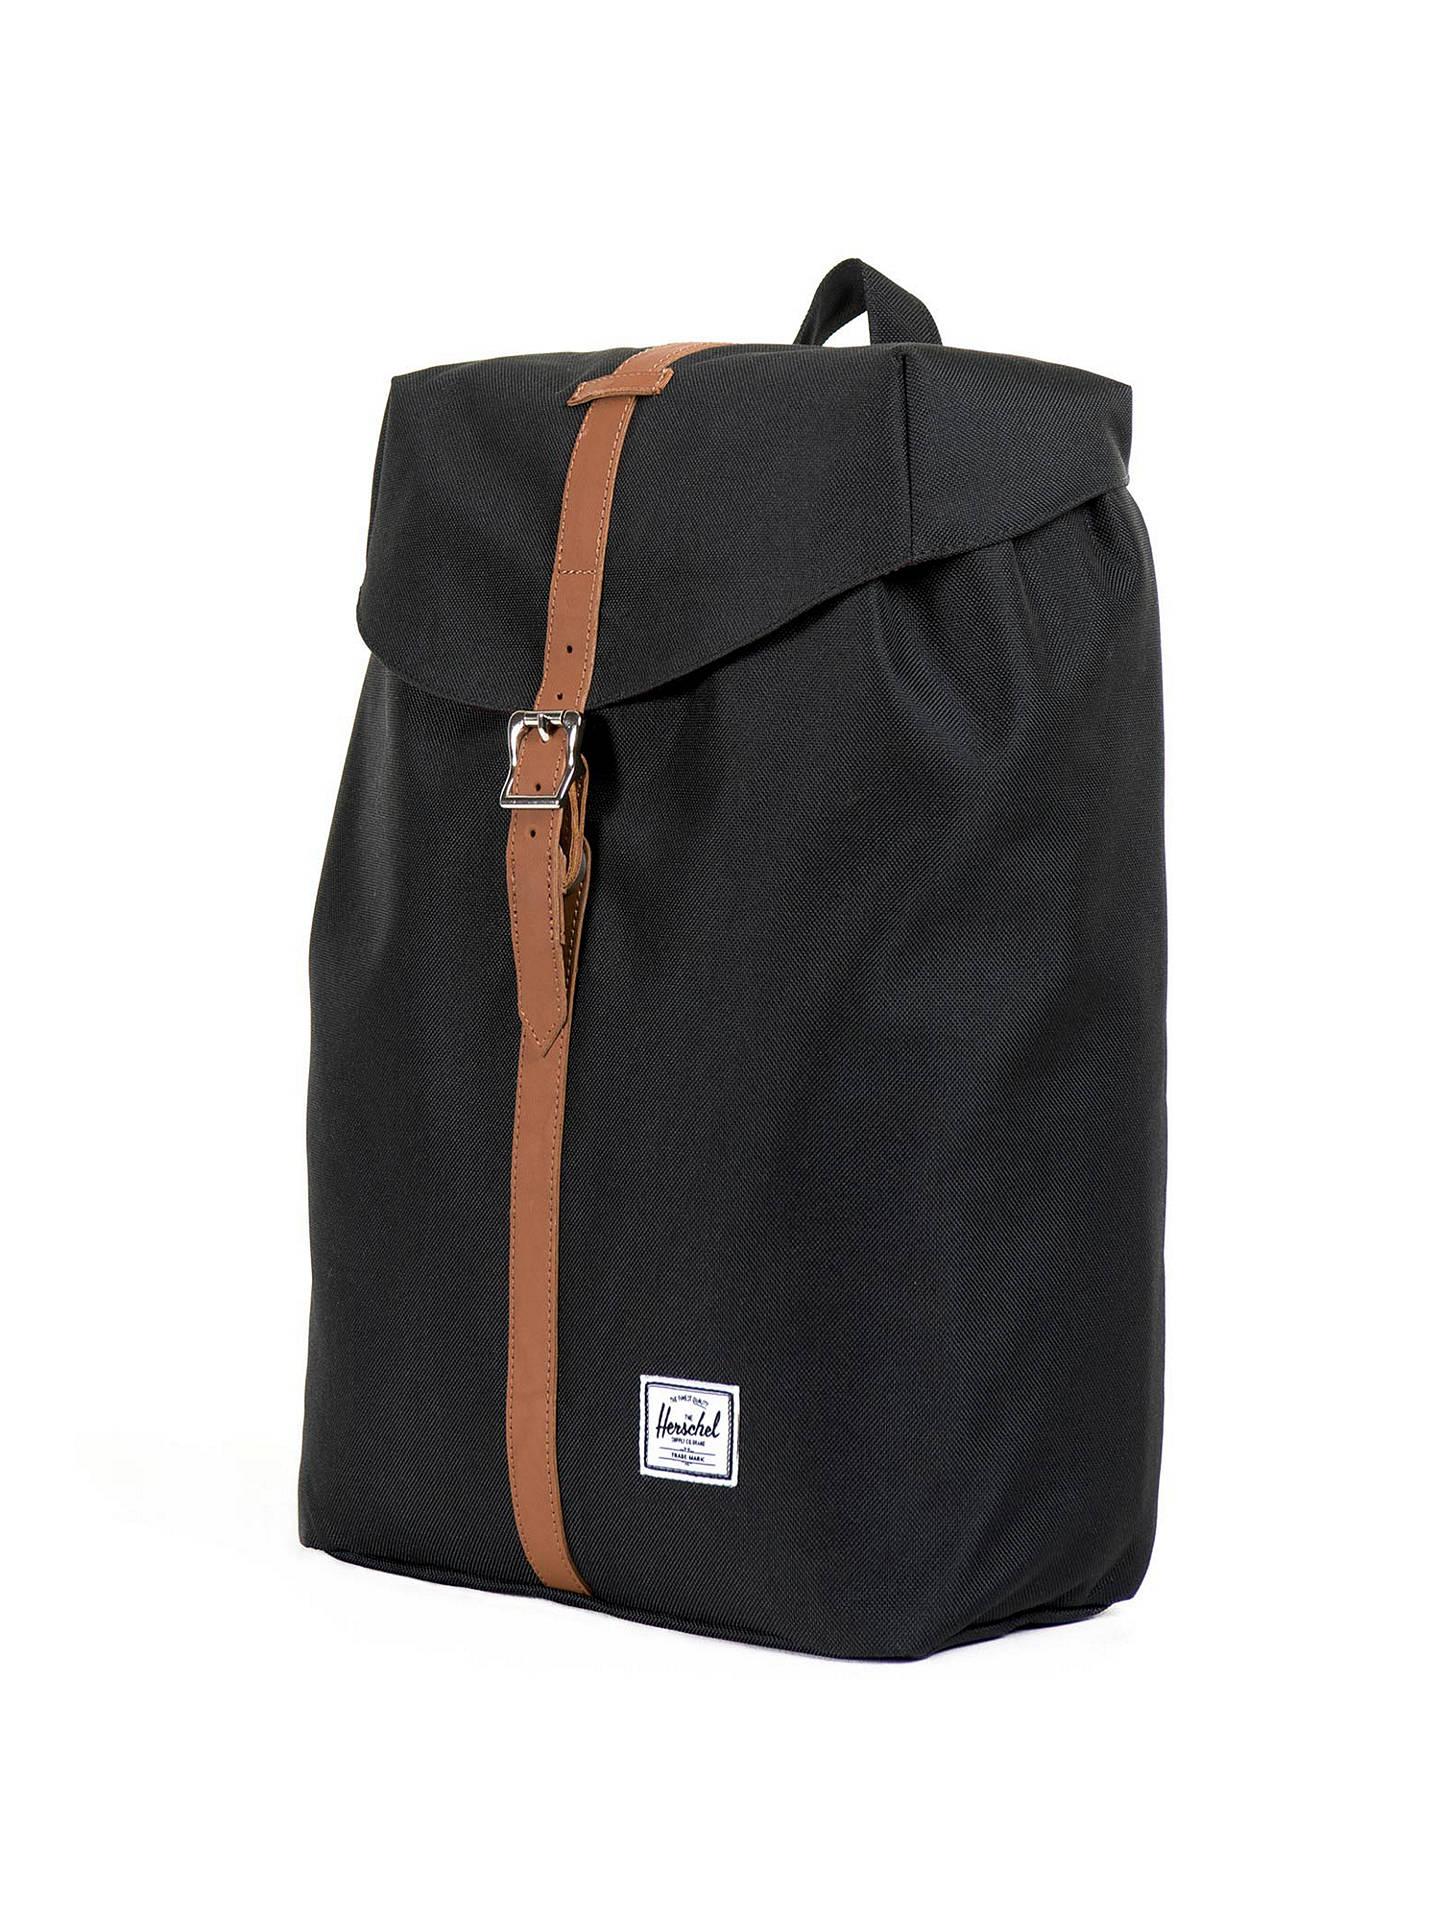 fd3480f5df7 Herschel Supply Co. Post Backpack at John Lewis   Partners